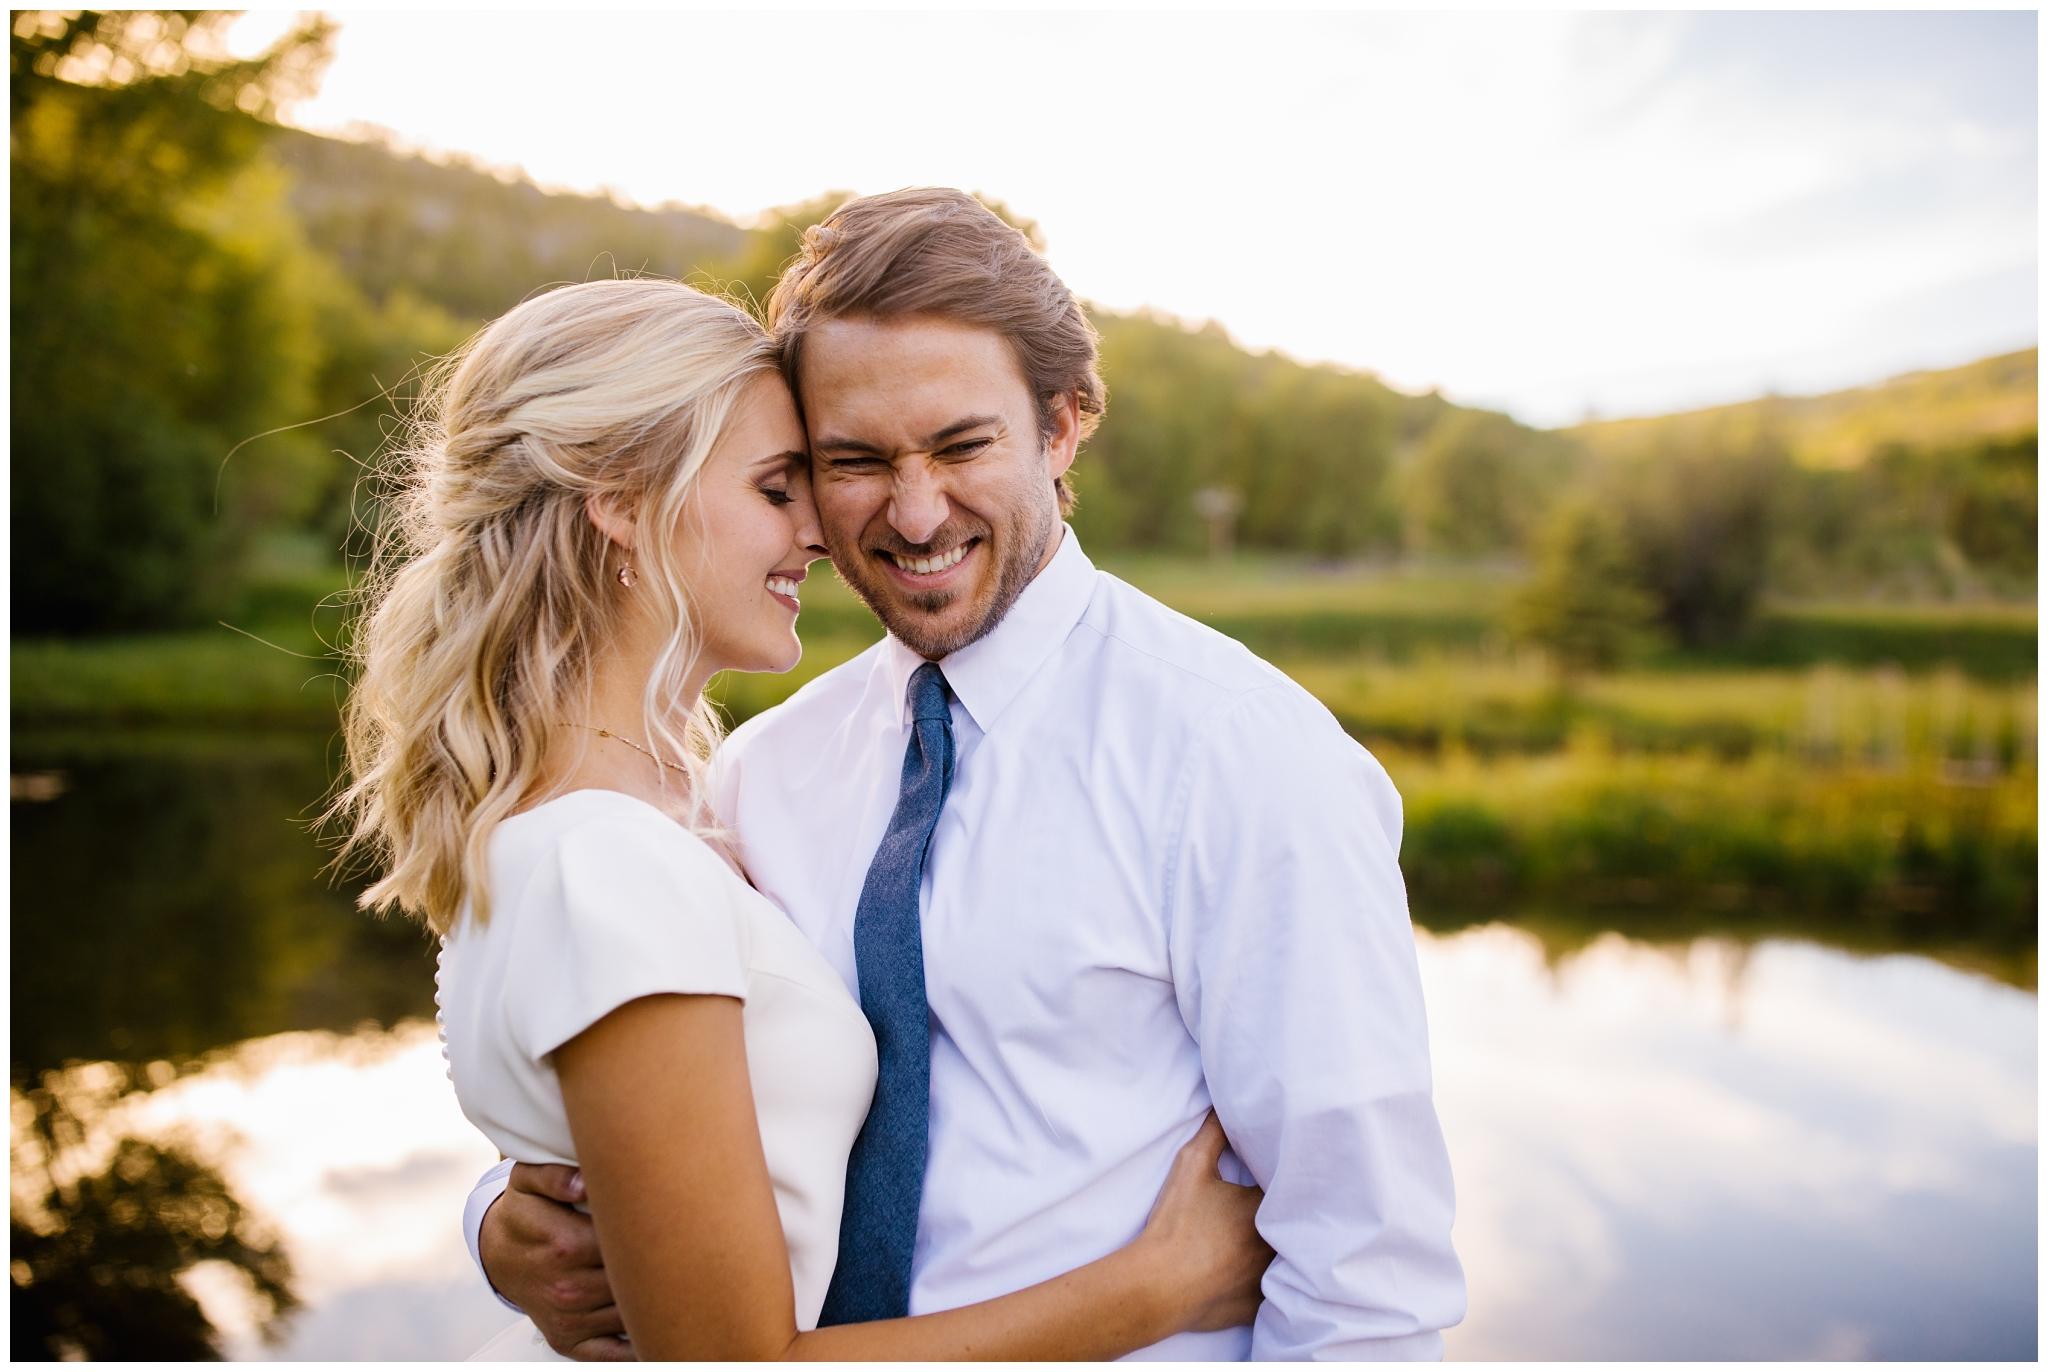 Lizzie-B-Imagery-Utah-Wedding-Photographer-Park-City-Photographer_0054.jpg